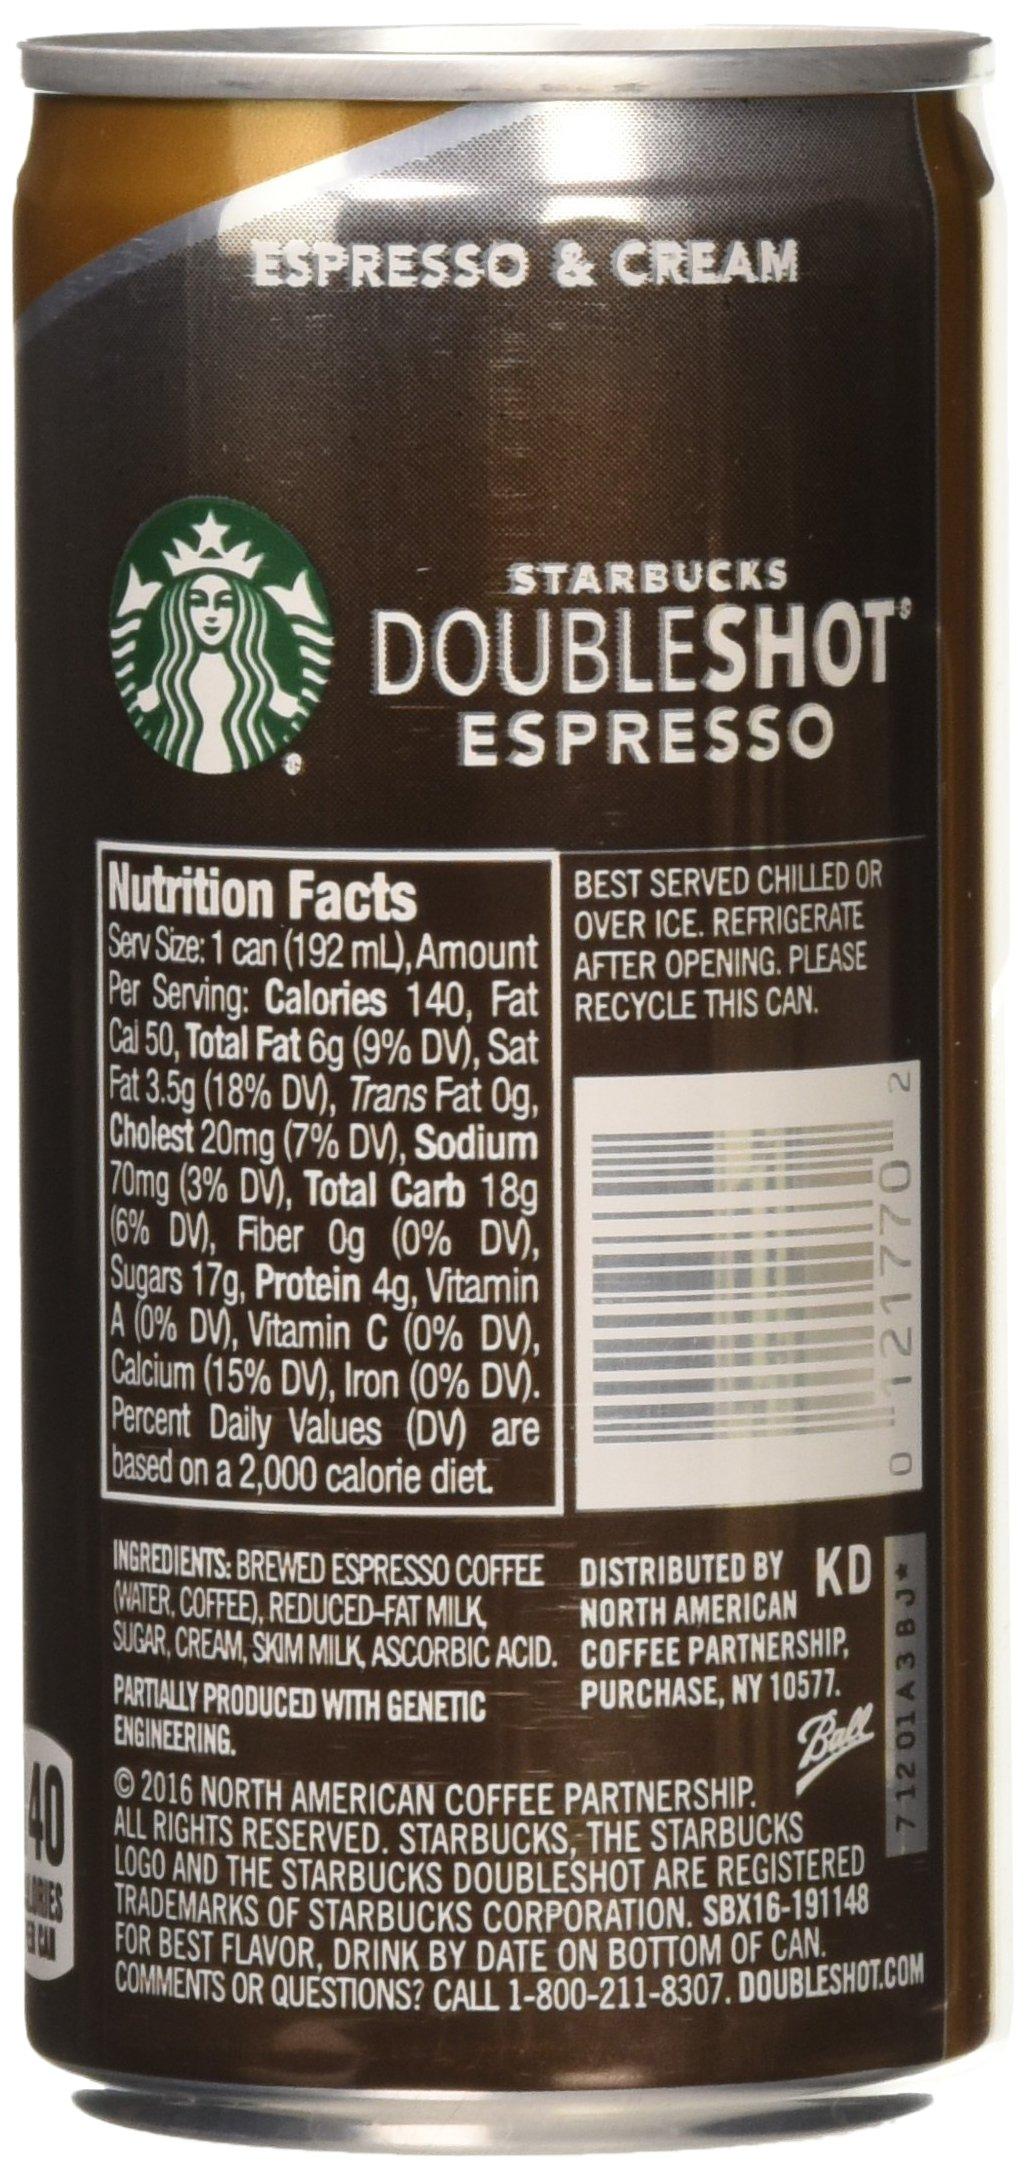 Starbucks Doubleshot, Espresso + Cream, 6.5 Ounce, 12 Pack by Starbucks (Image #3)